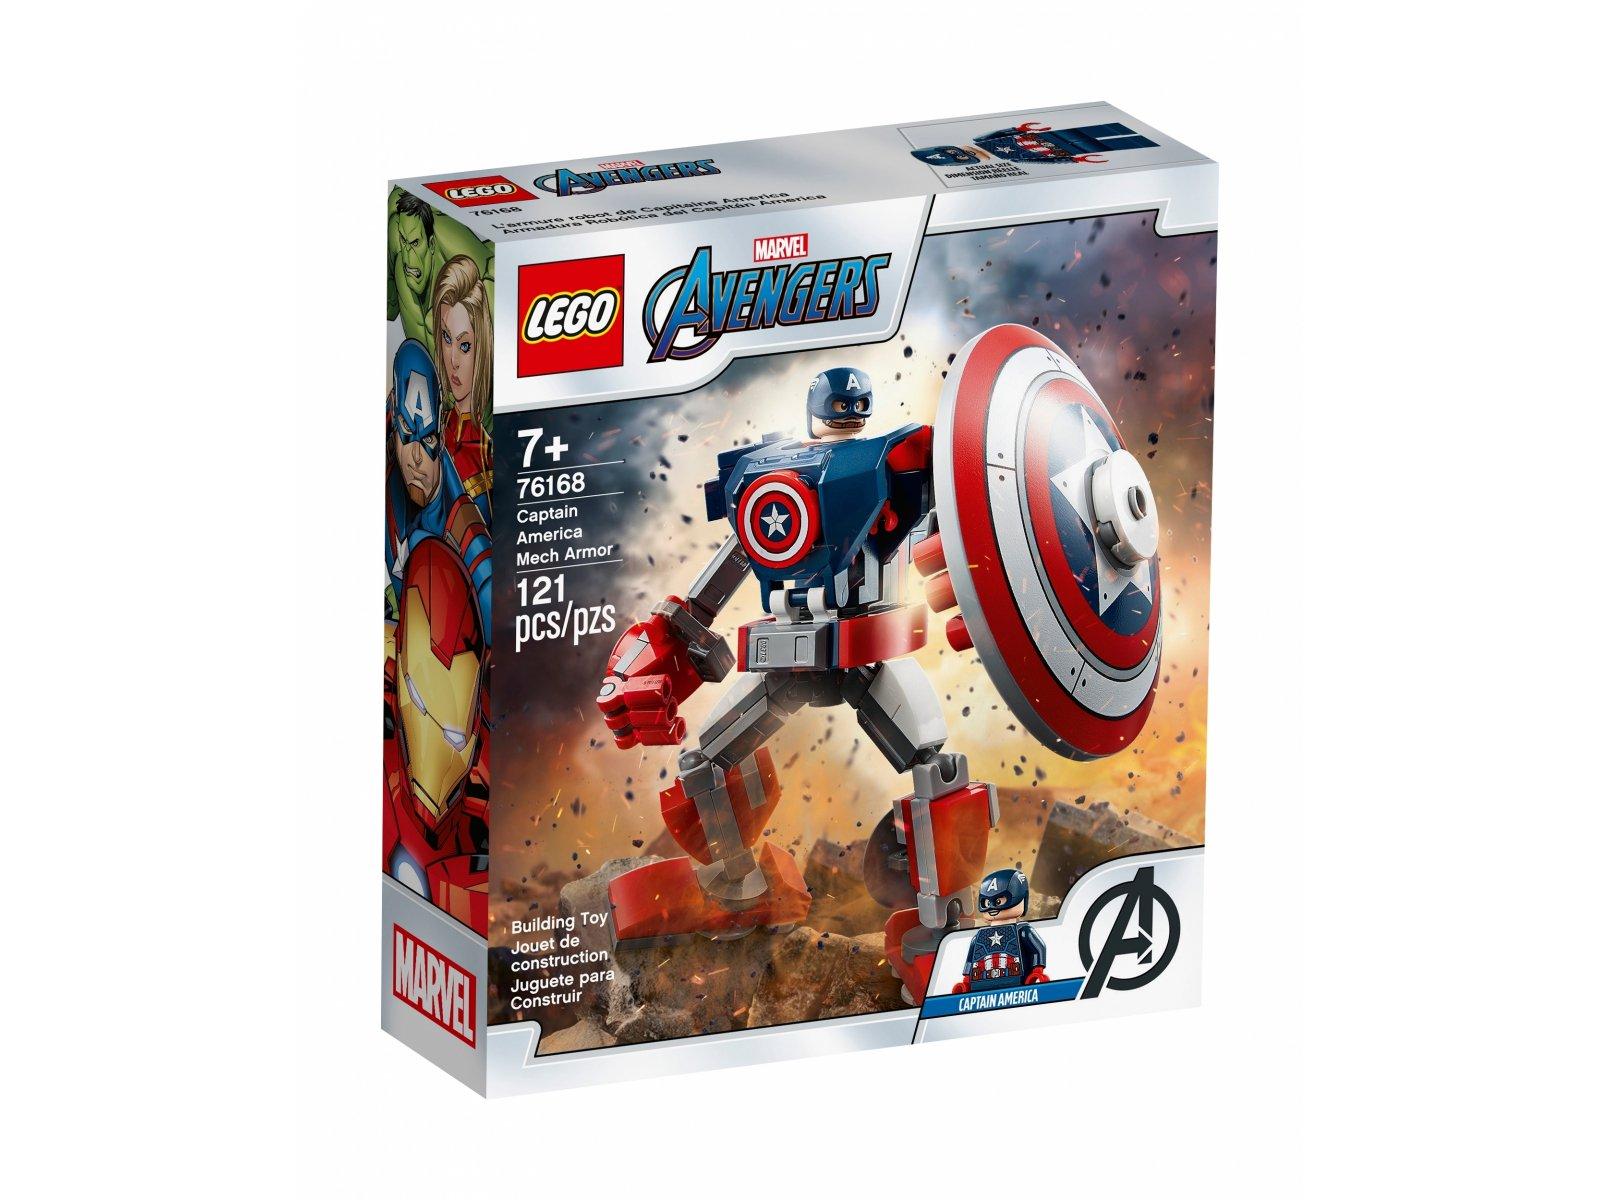 LEGO Marvel Avengers Opancerzony mech Kapitana Ameryki 76168